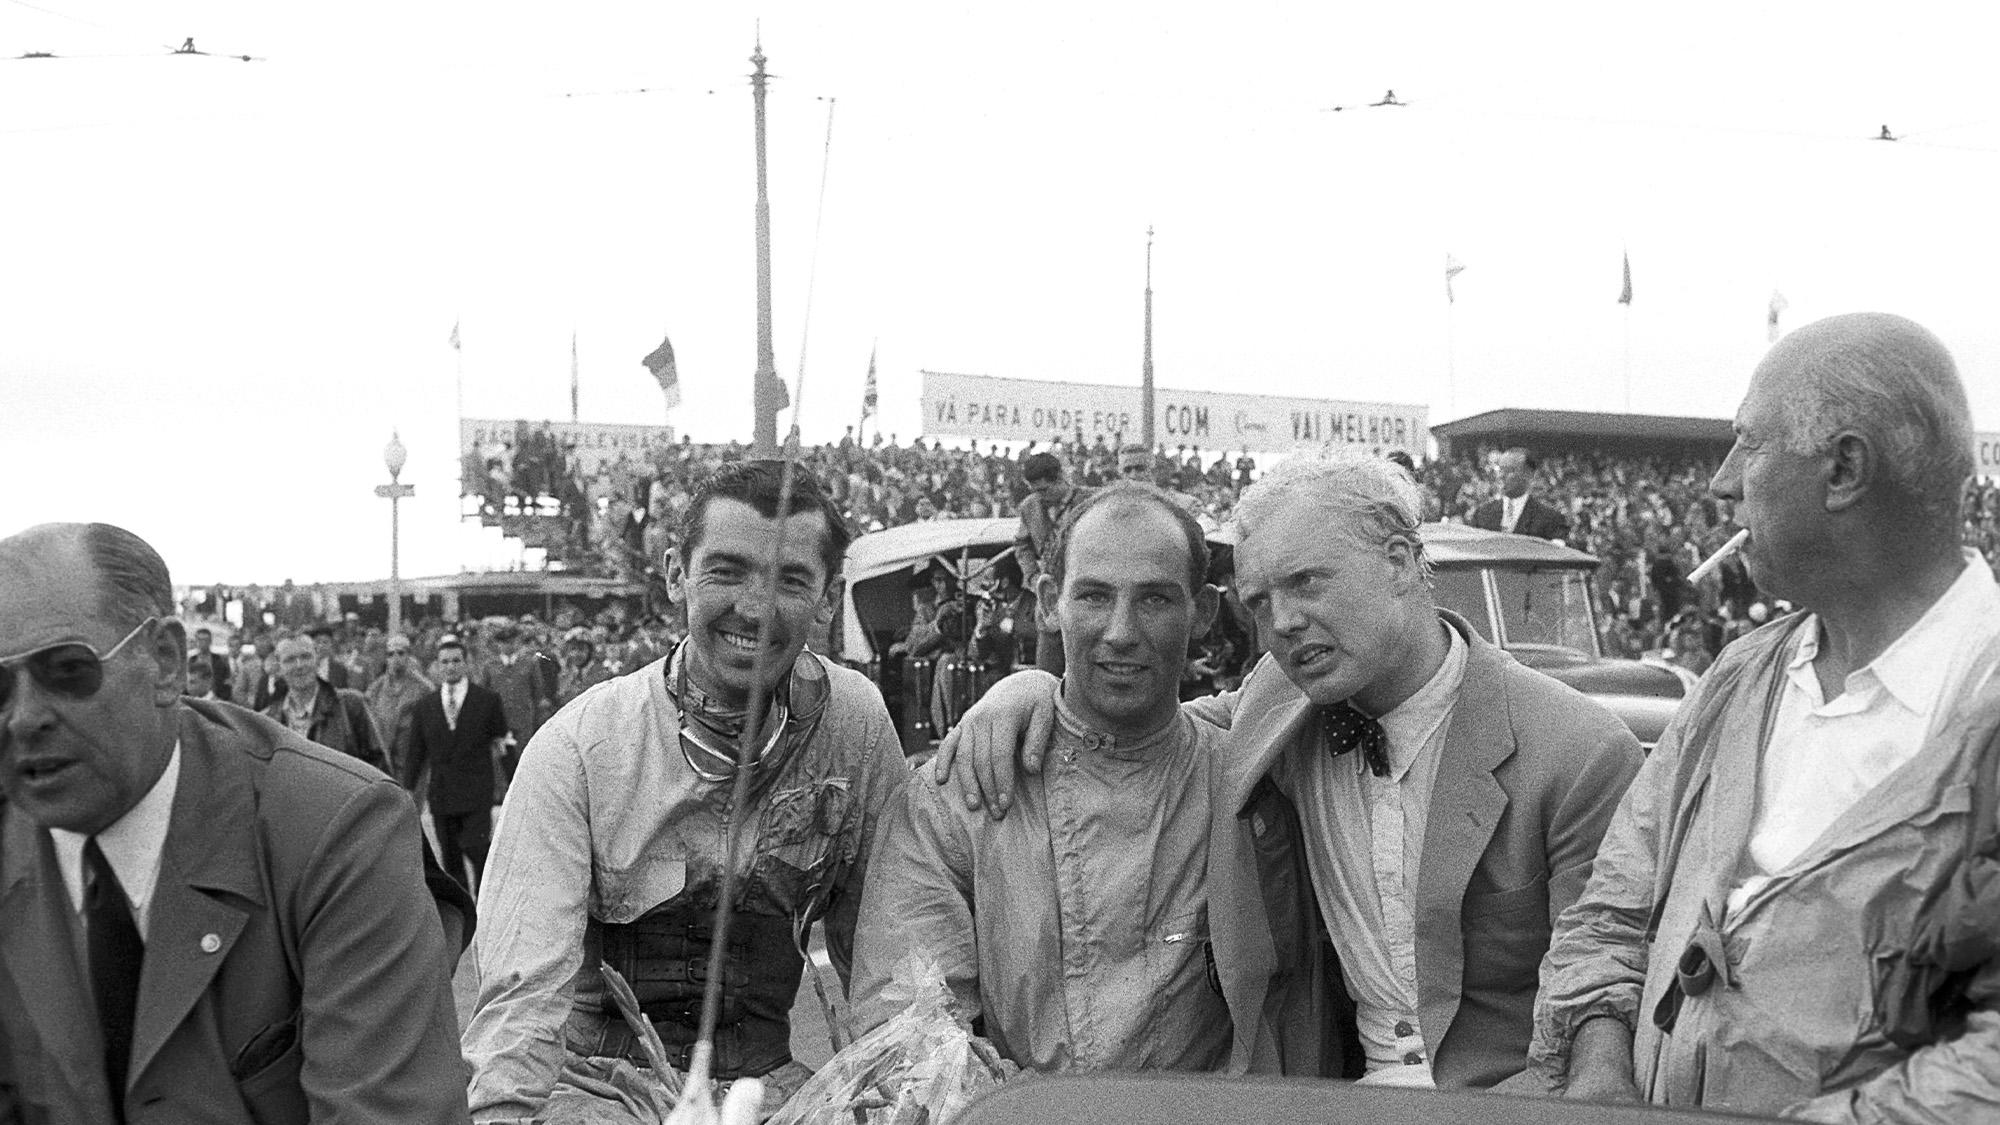 Stuart Lewis Evans, Stirling Moss, Mike Hawthorn, 1958 Grand Prix of Portugal, Boavista